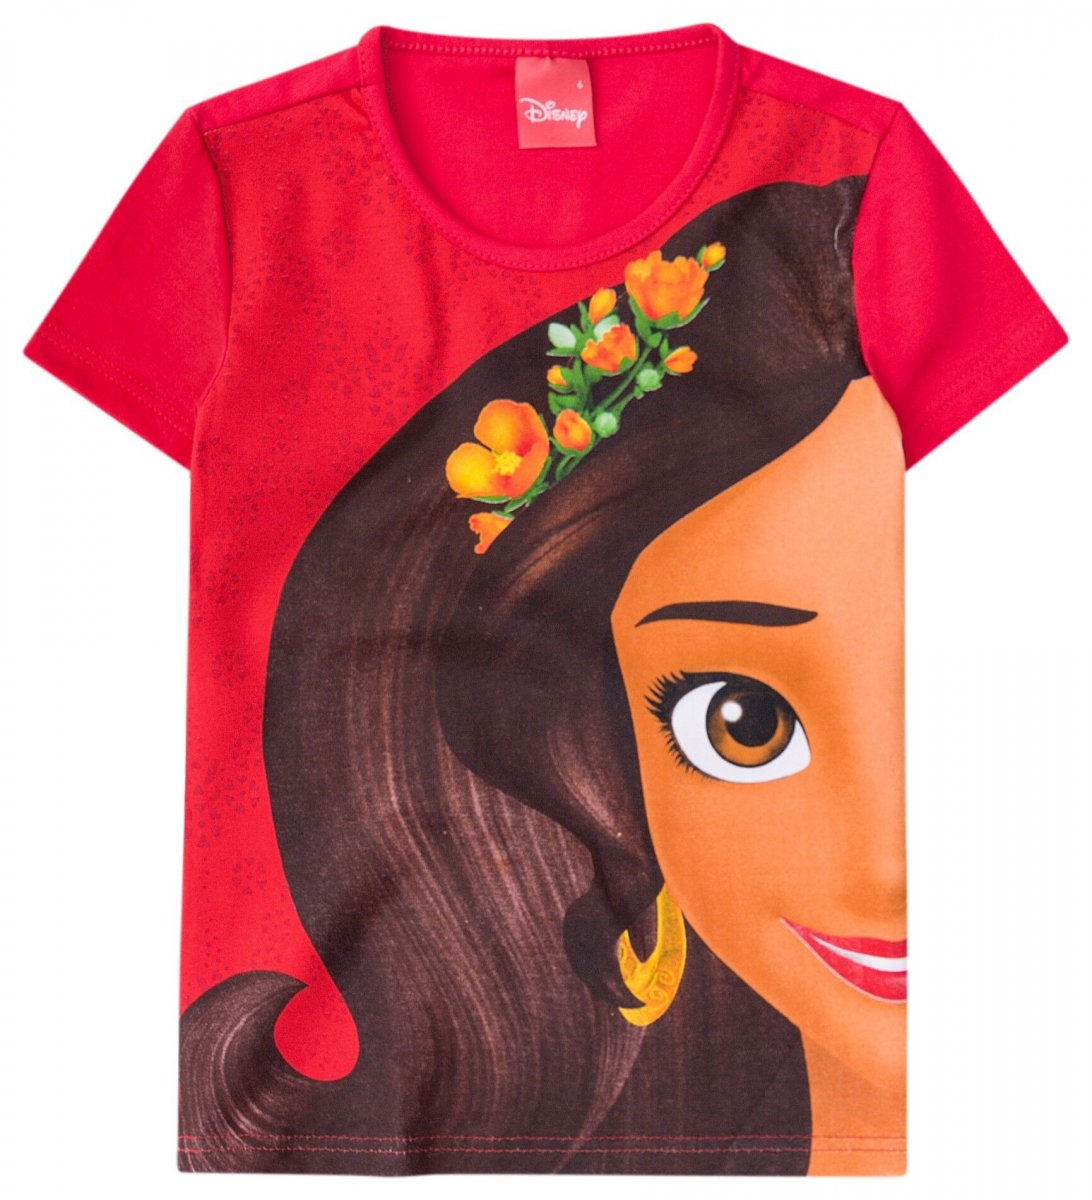 Blusa da princesa Elena - Malwee Vermelho  c57ea89731b